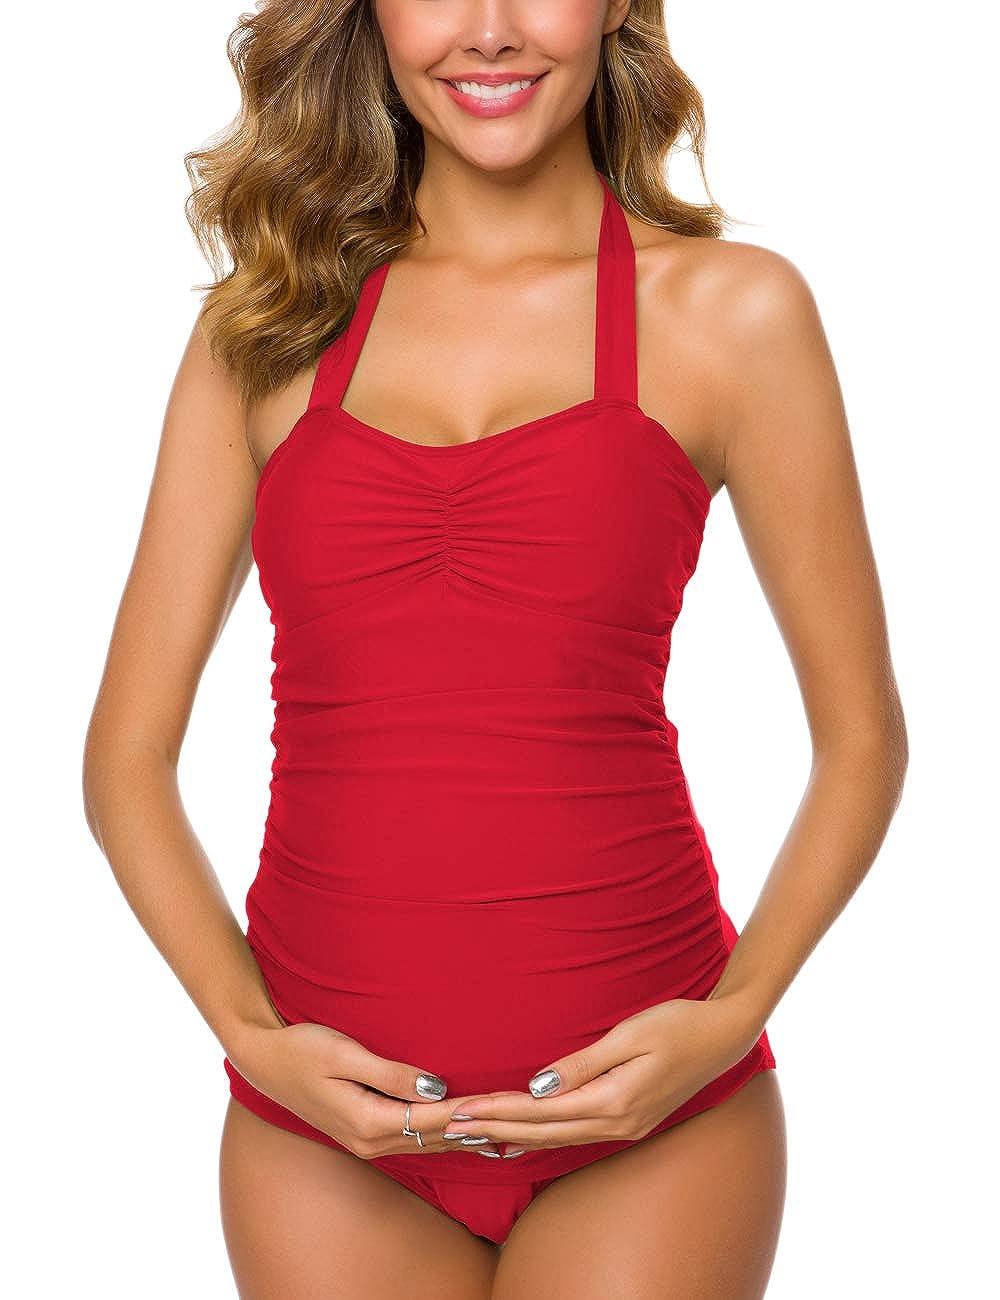 7eb7da5c564 Ziola Women One Piece Maternity Shirred Tank Swimsuits Vintage Ruched  Swimwear Plus Size Pregnancy Beachwear